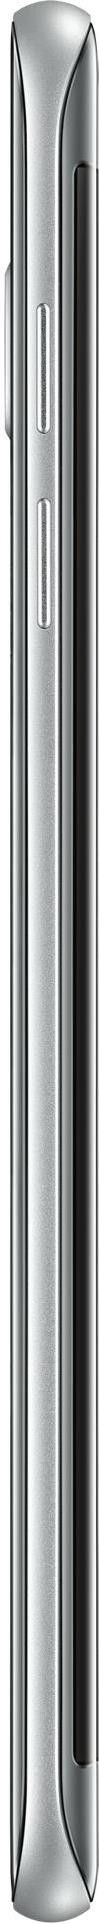 Мобильный телефон Samsung Galaxy S7 Edge Duos G935 (SM-G935FZSUSEK) Silver - 2